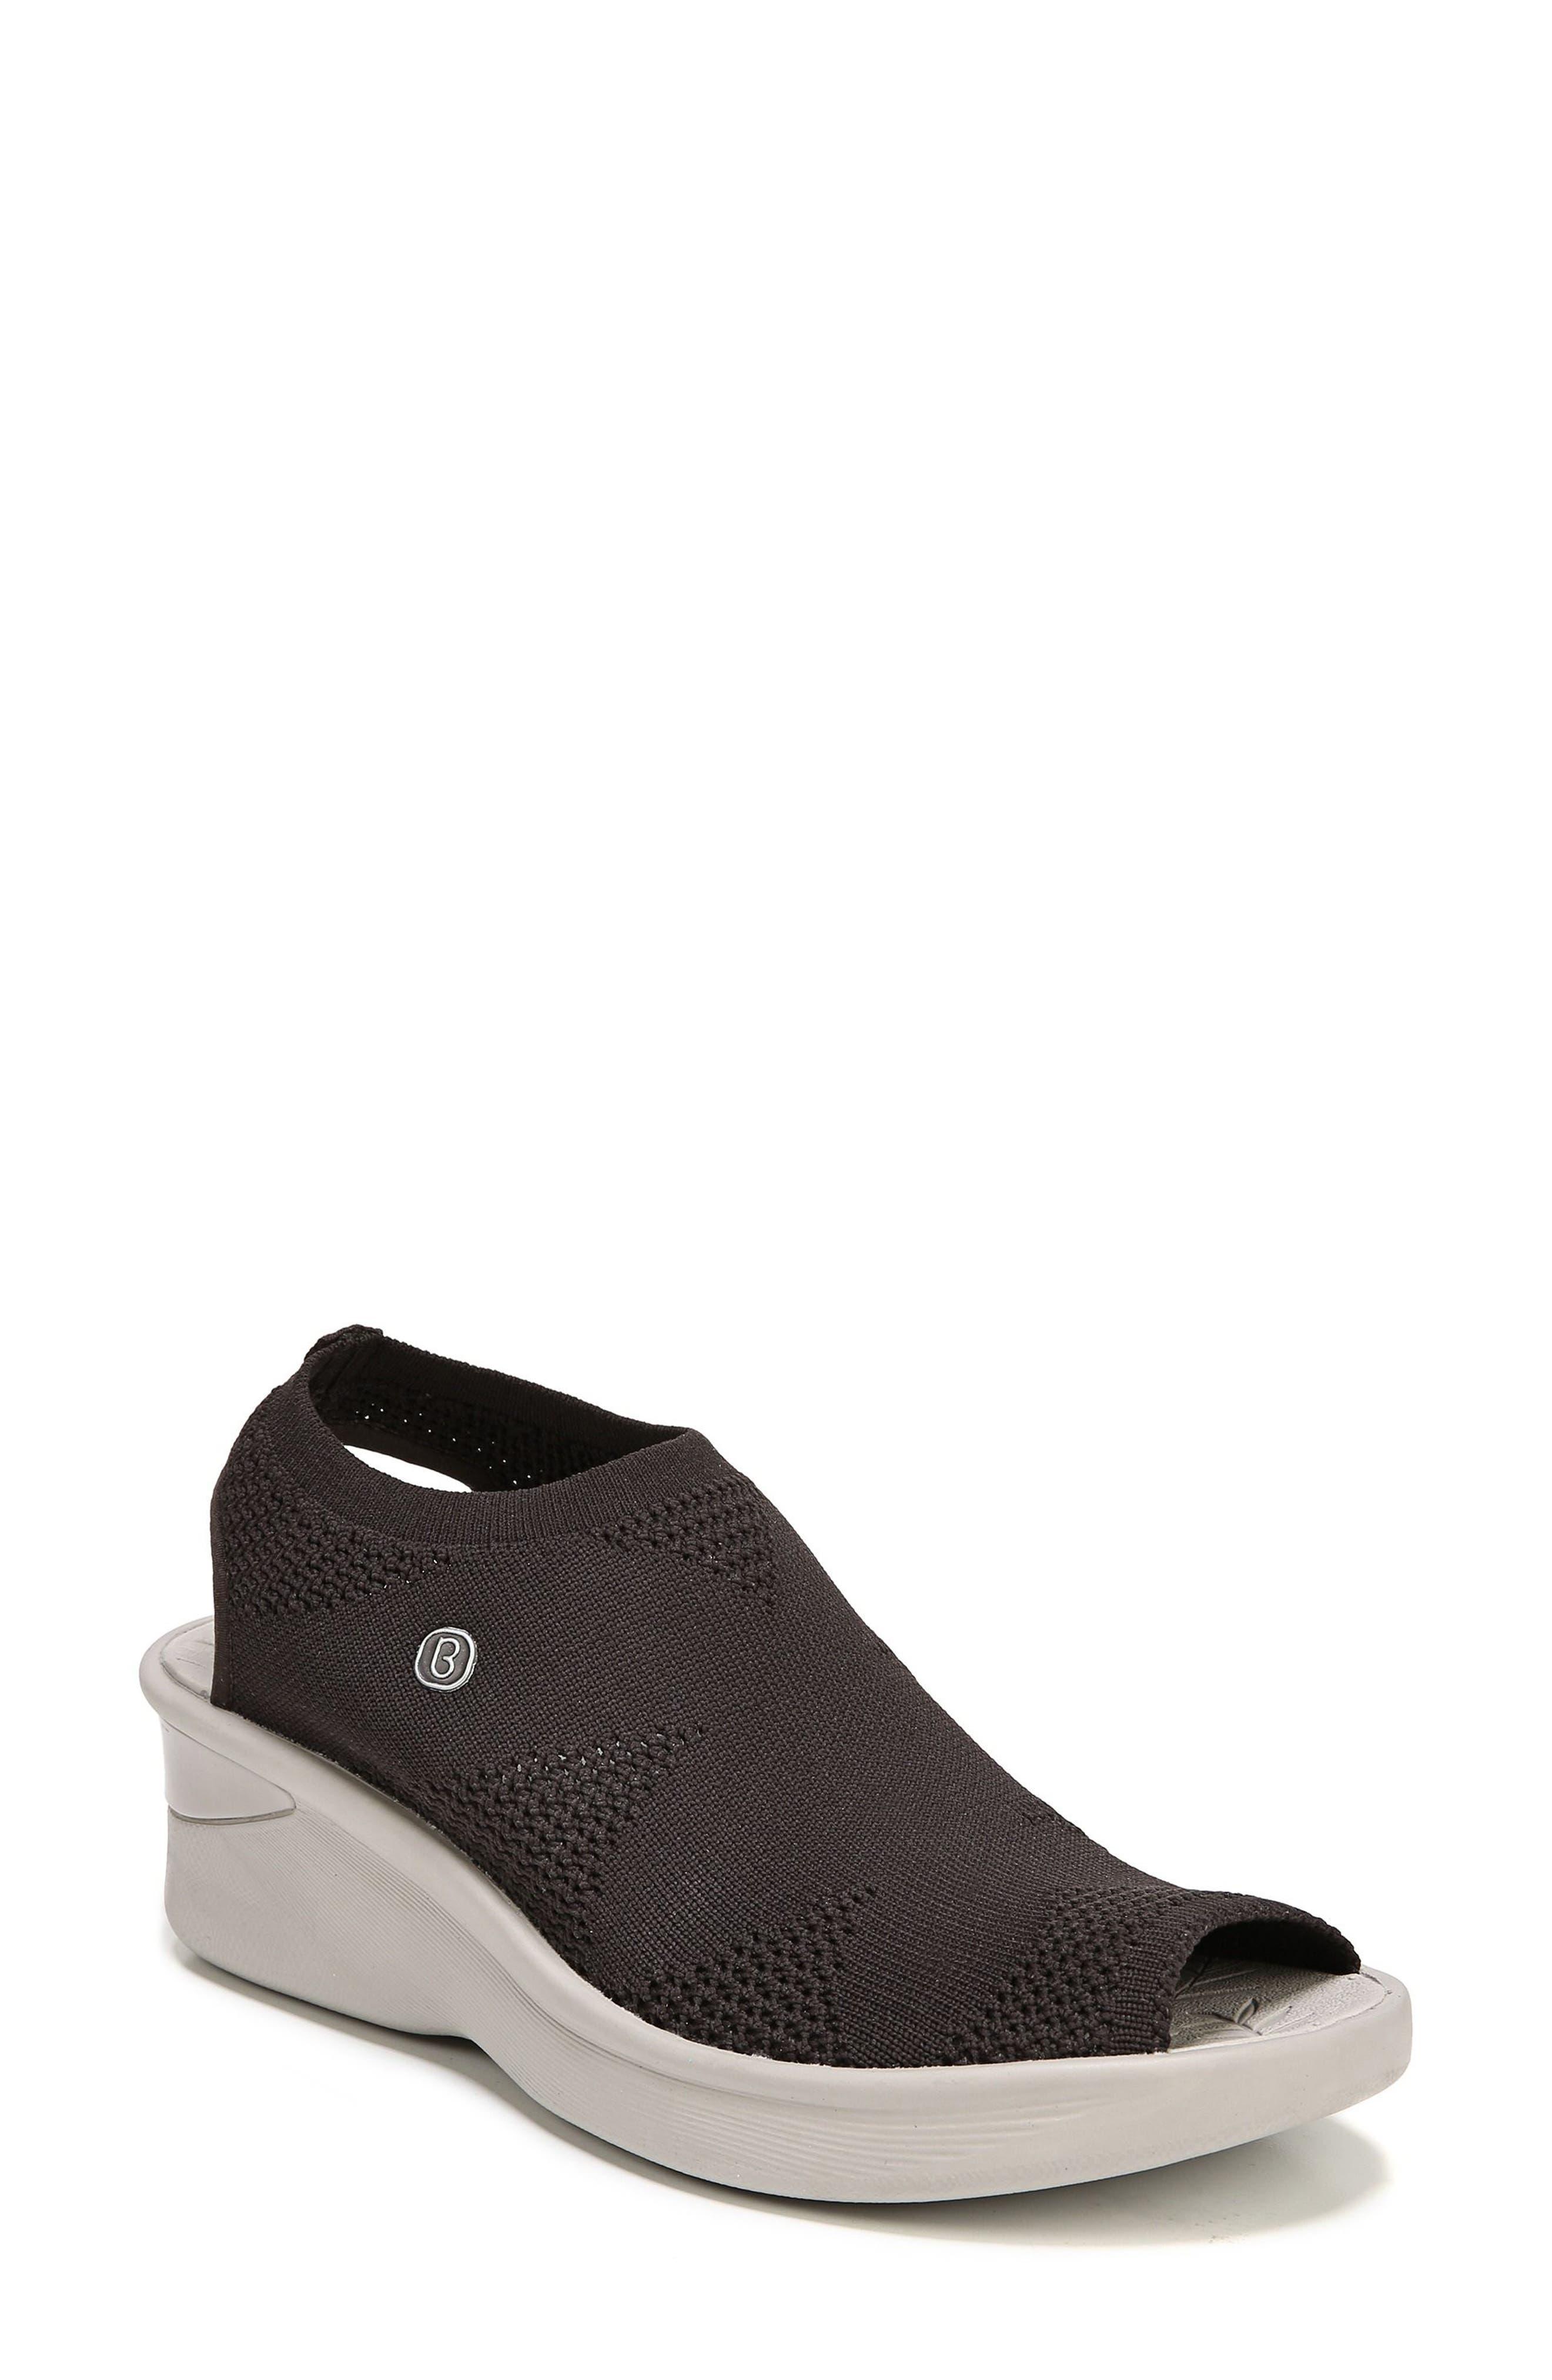 Secret Peep Toe Knit Sneaker,                         Main,                         color, BROWN FABRIC